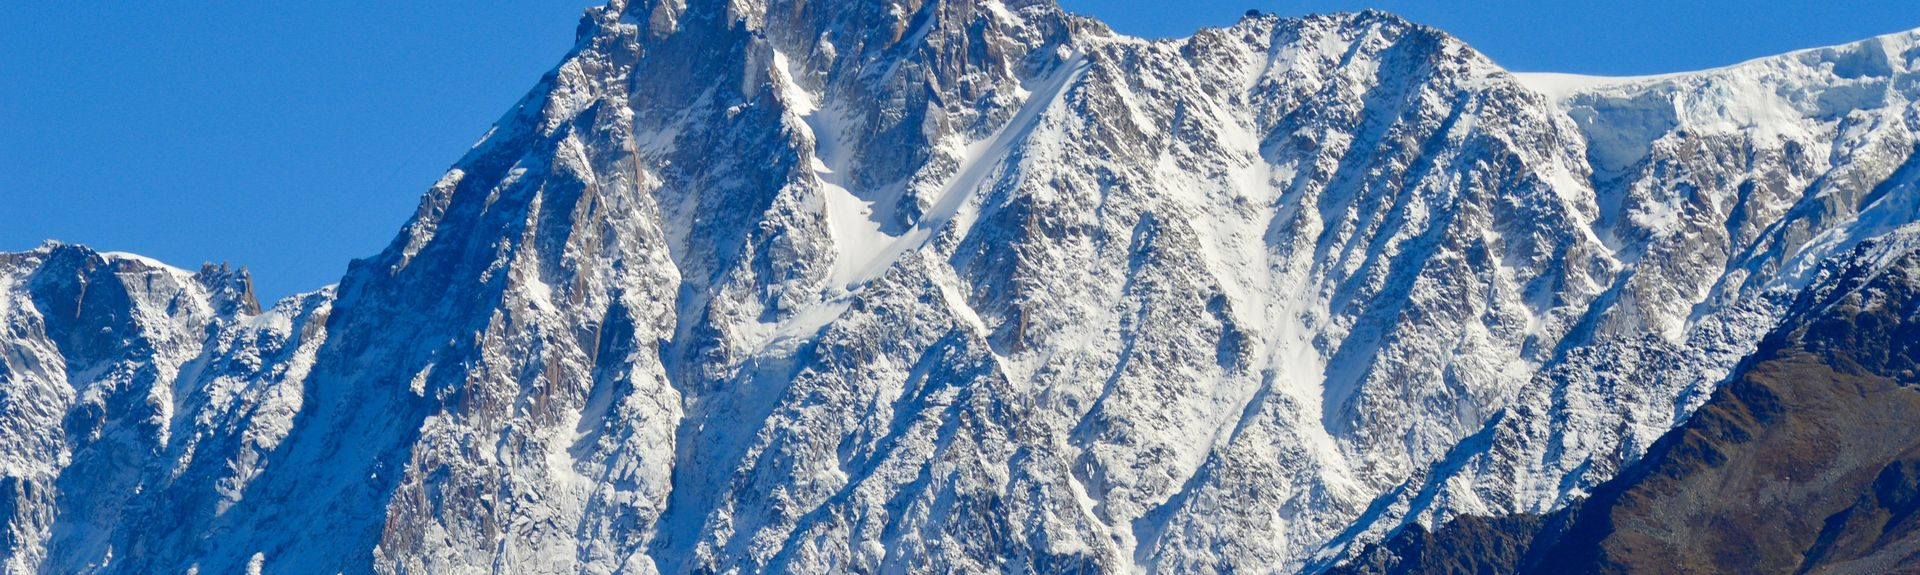 Chamonix - Planpraz skiheis, Chamonix-Mont-Blanc, Frankrike